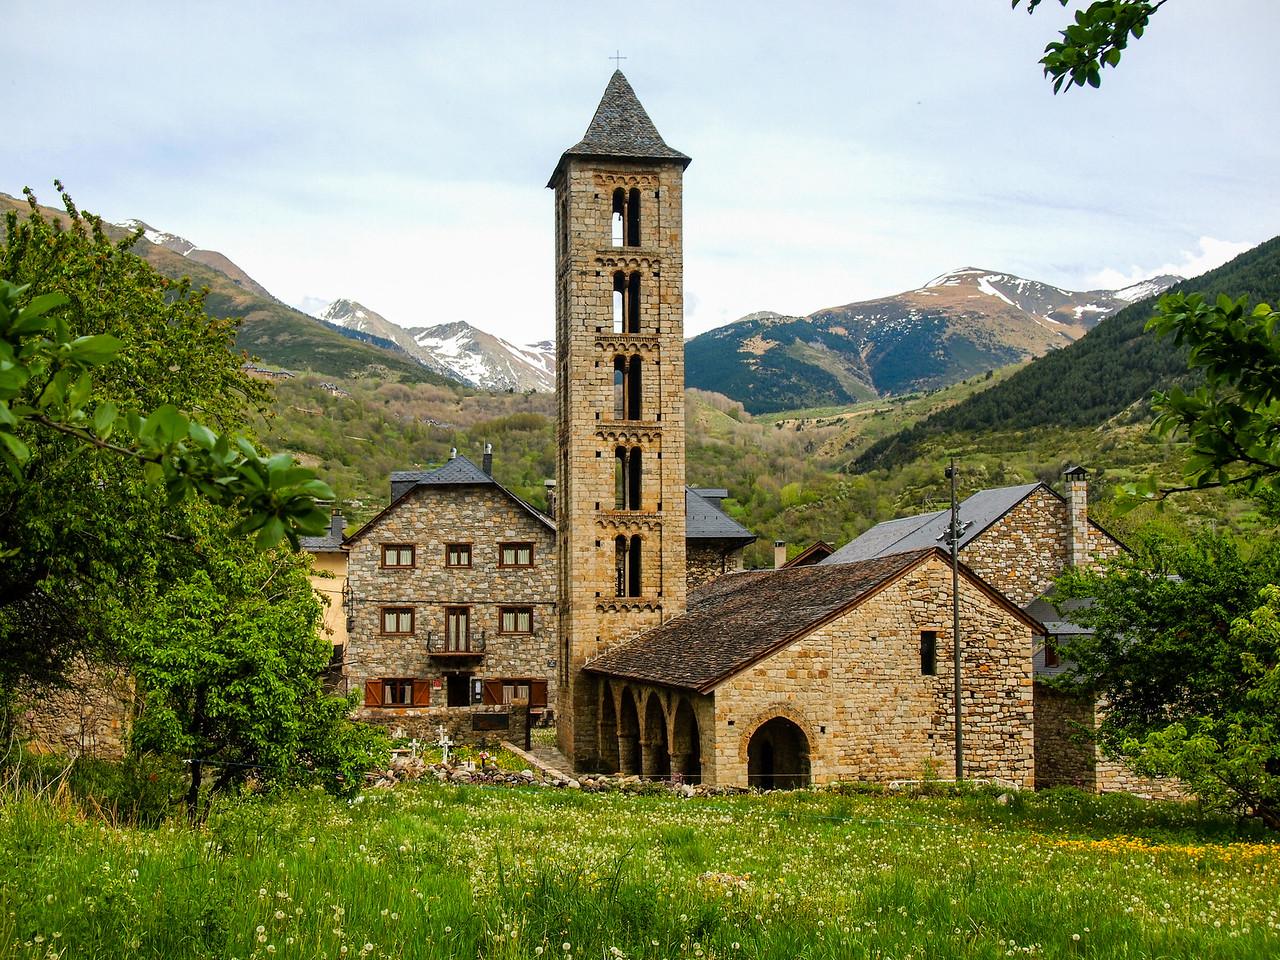 Romanesque church in the Vall de Boi in Spain